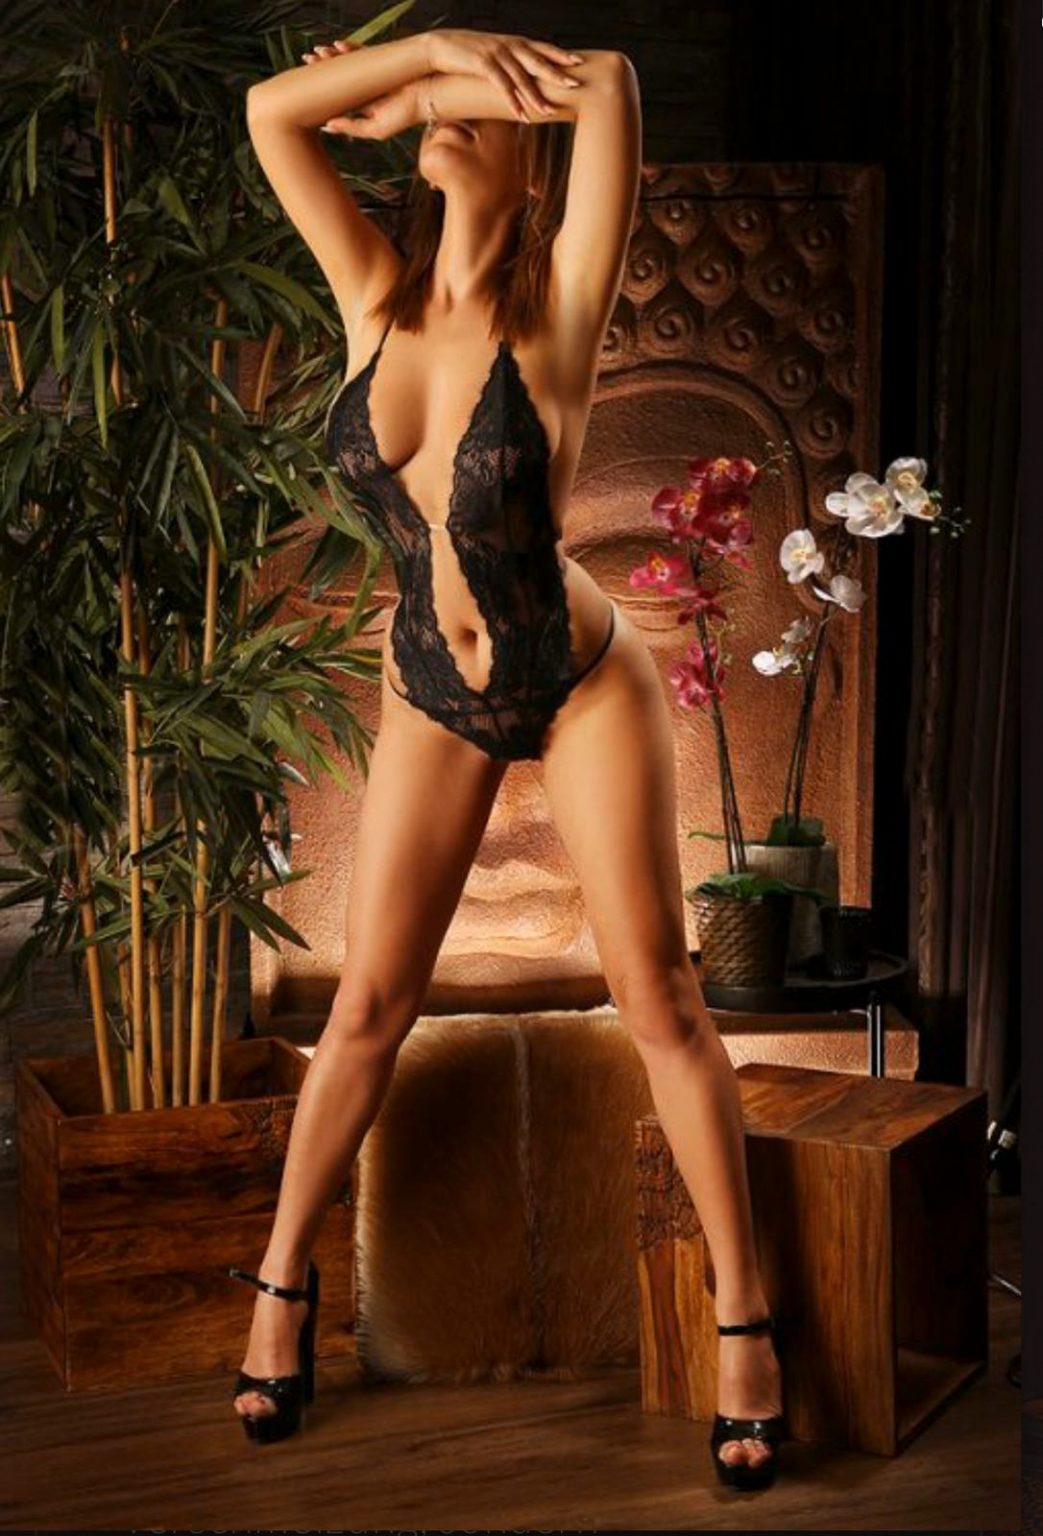 Sara_122019_02 - Erotik Massage Hannover